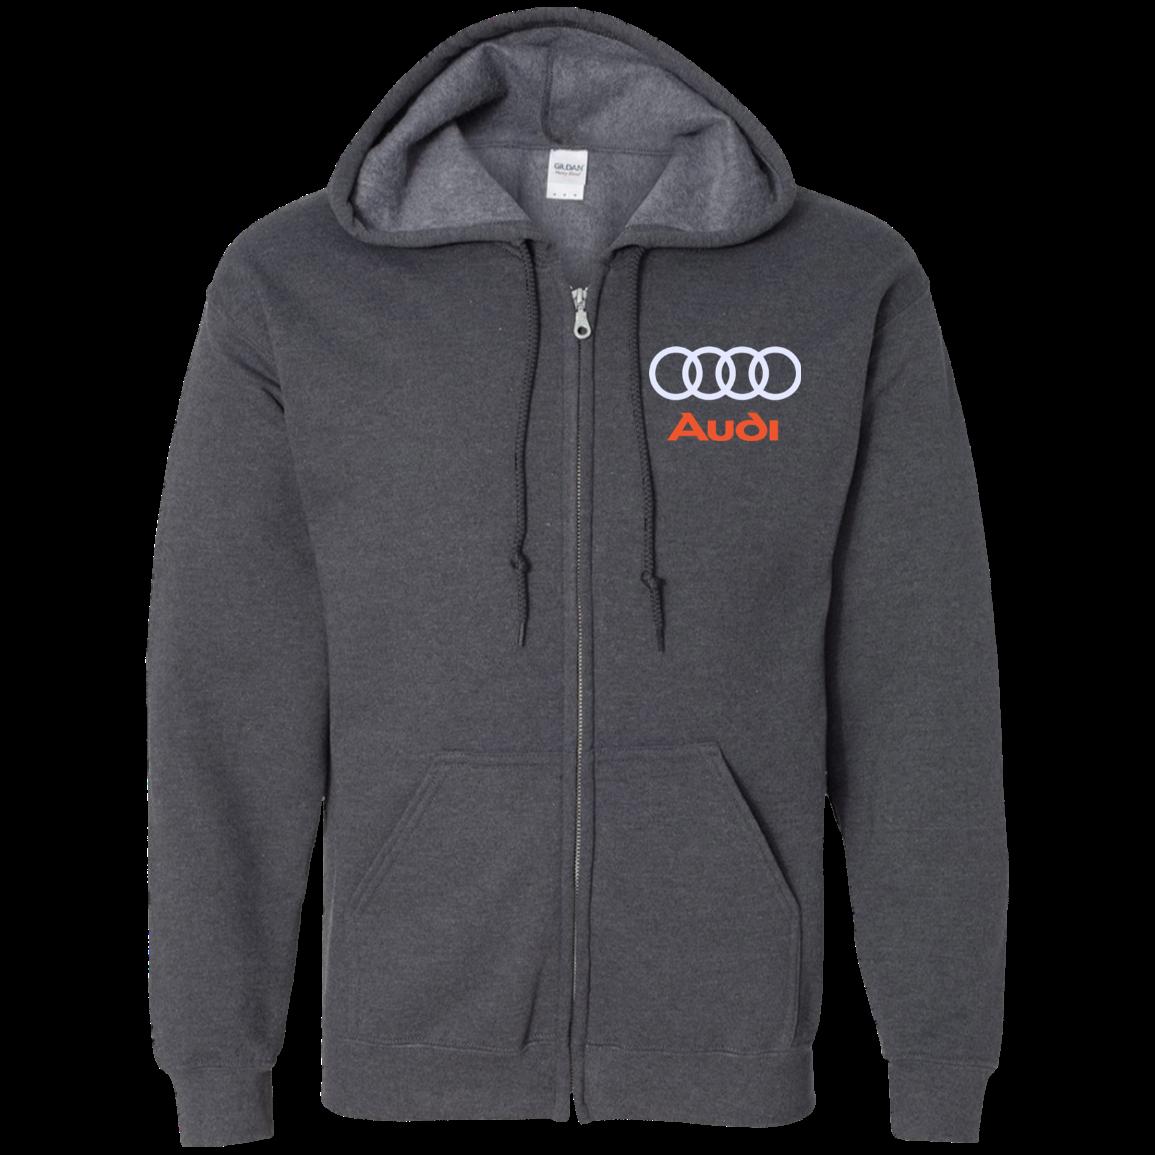 Audi Embroidered Zip Up Hooded Sweatshirt | Hooded